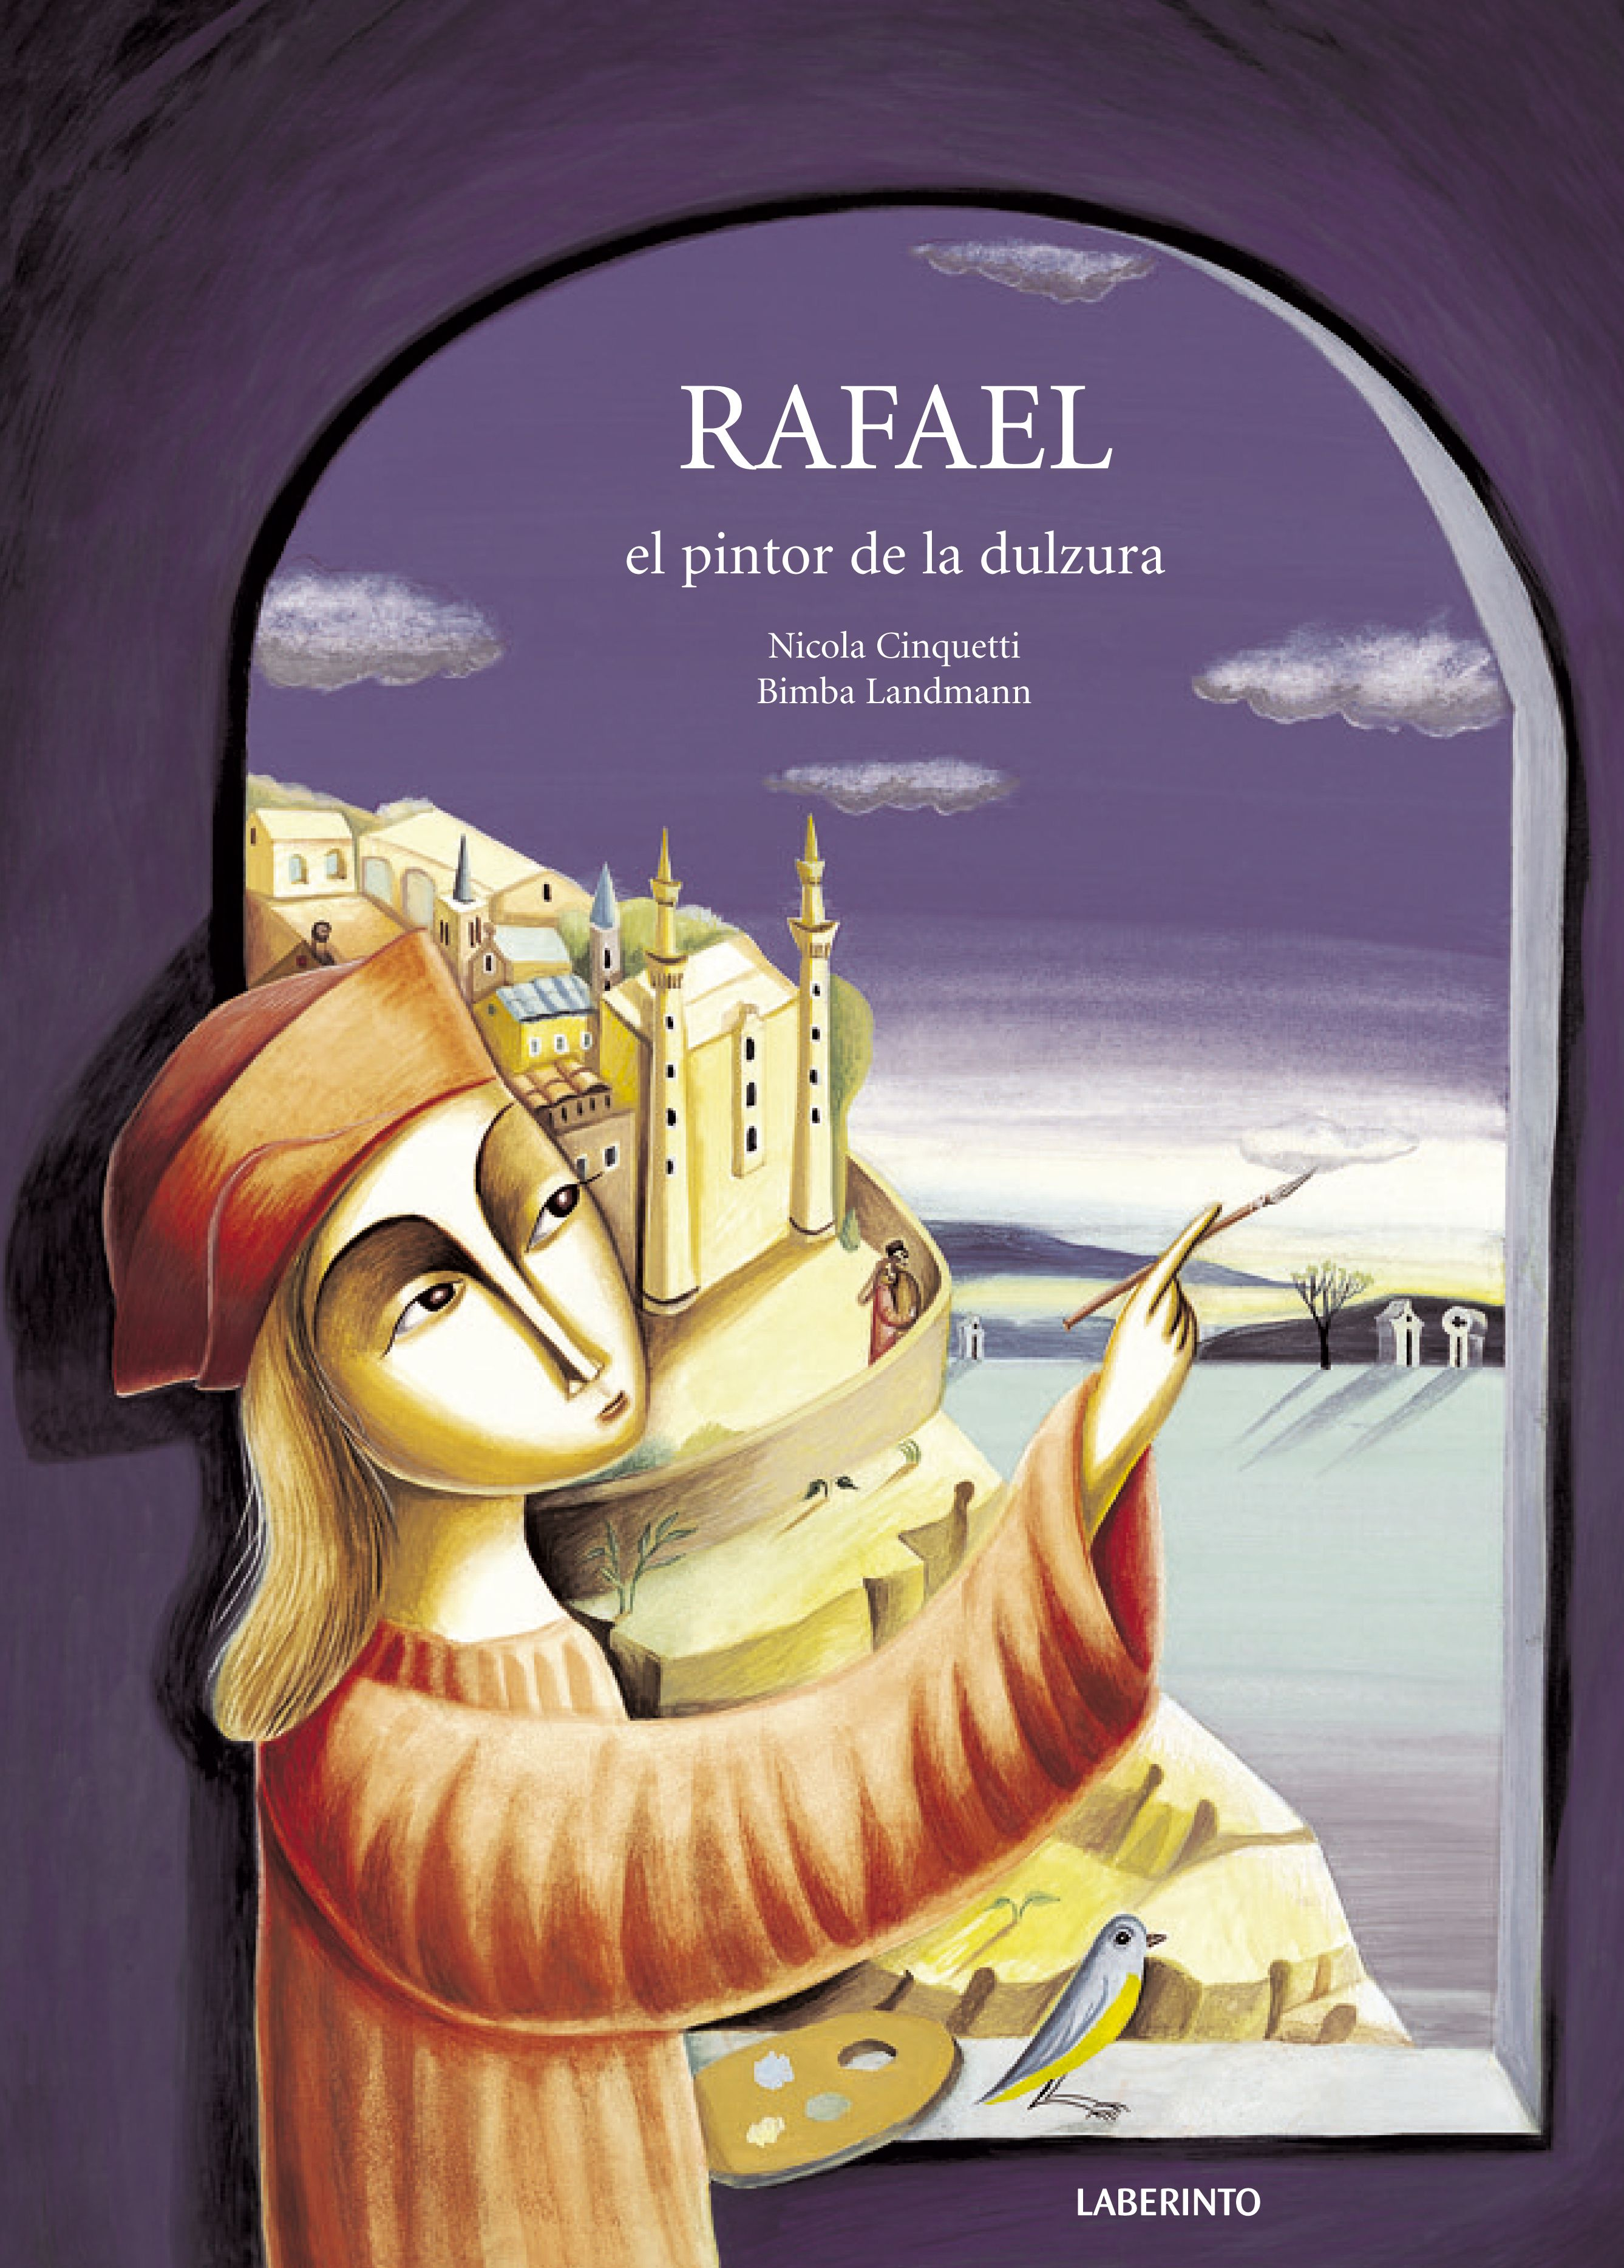 Rafael, el pintor de la dulzura http://www.edicioneslaberinto.es/libros/531/rafael-el-pintor-de-la-dulzura